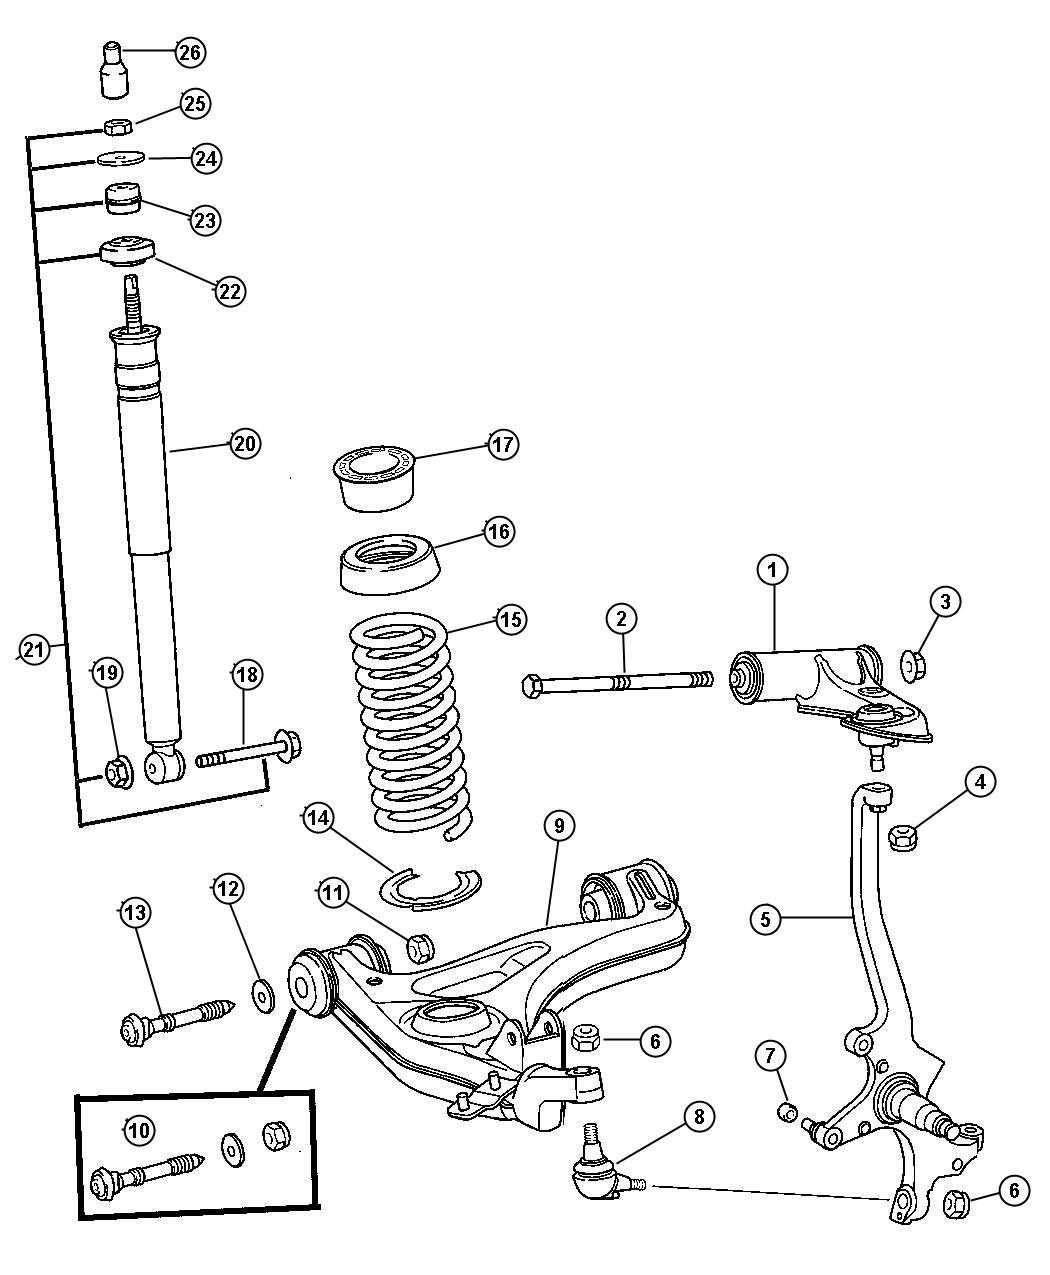 Chrysler 300m Front Suspension Diagram. chrysler 300m oem